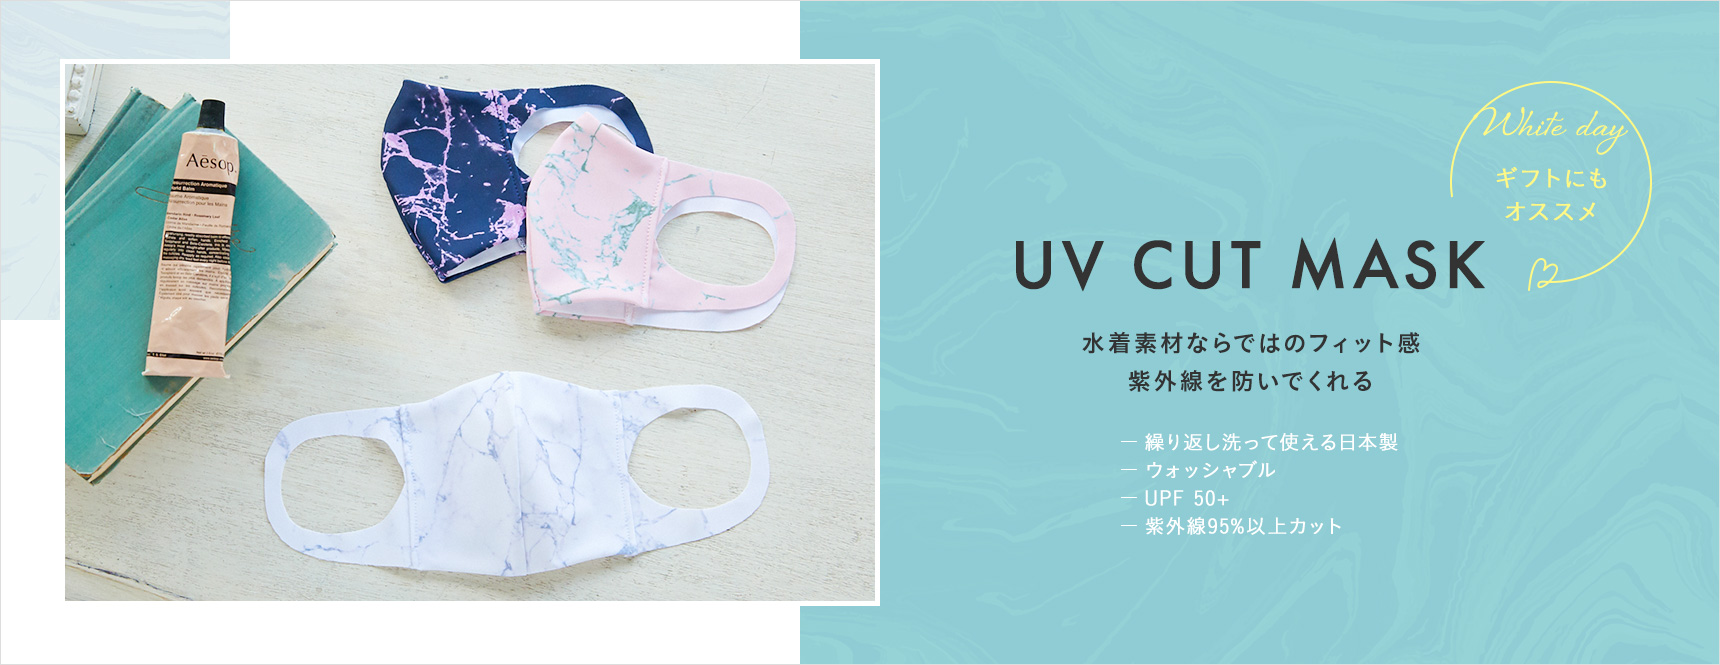 UV CUT MASK|水着ならではのフィット感|ギフトにおすすめ